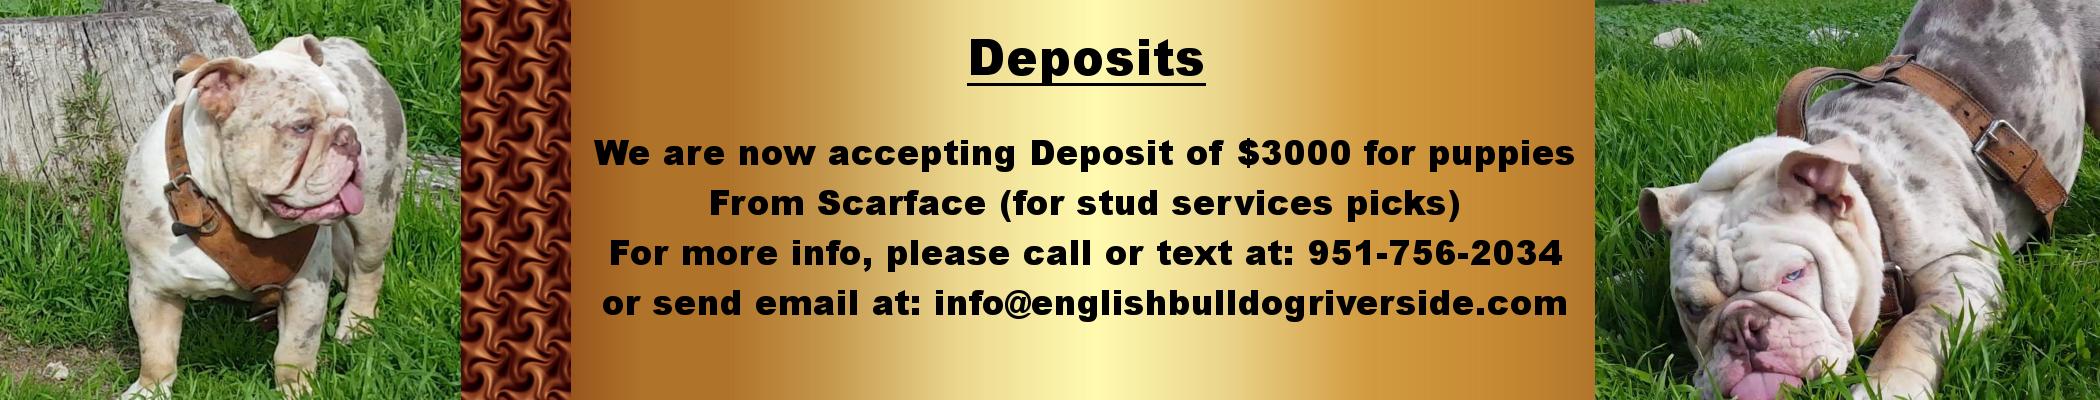 Deposit_Scarface